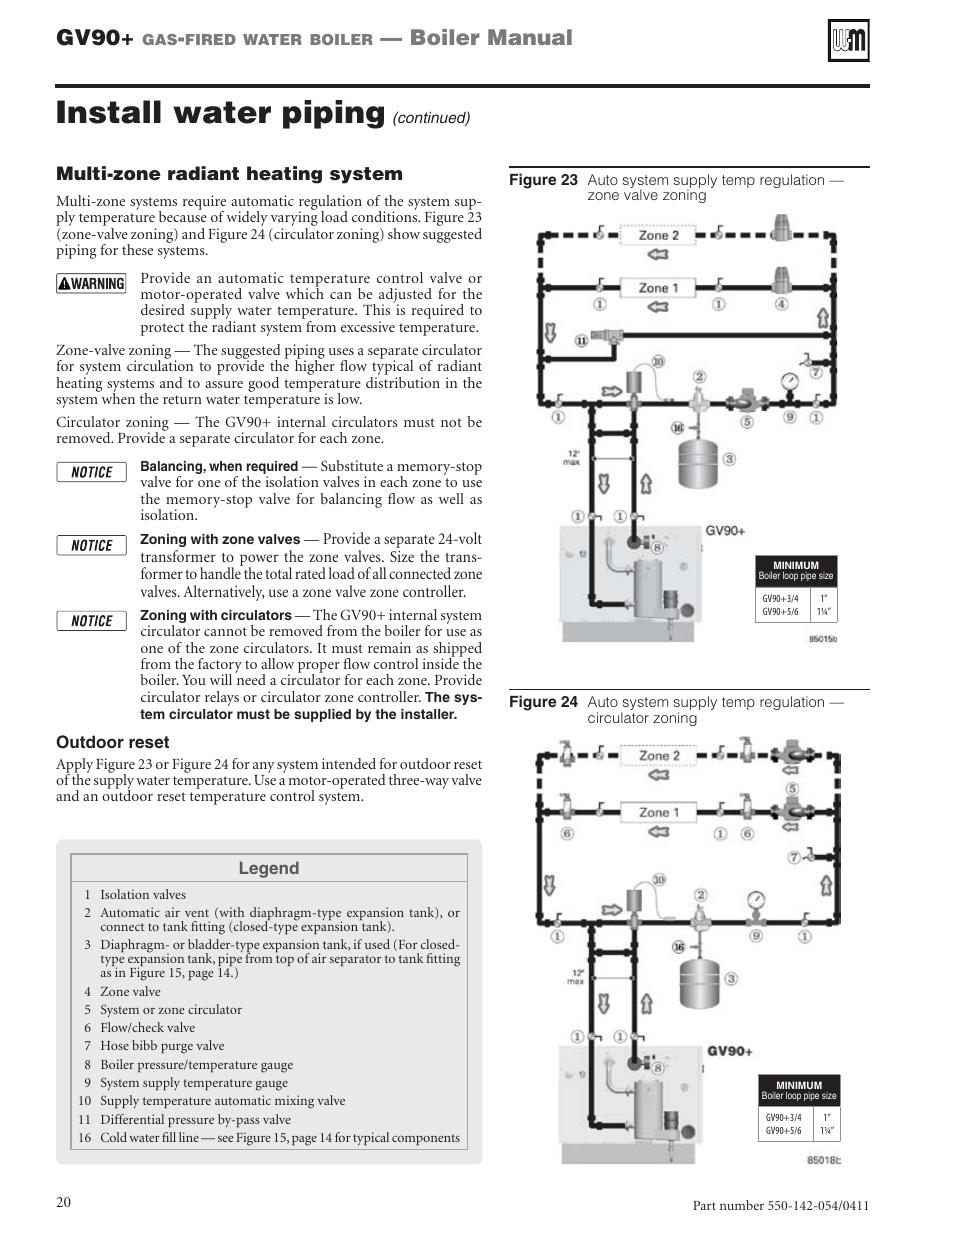 medium resolution of install water piping gv90 boiler manual weil mclain gv90 user weil mclain piping diagrams